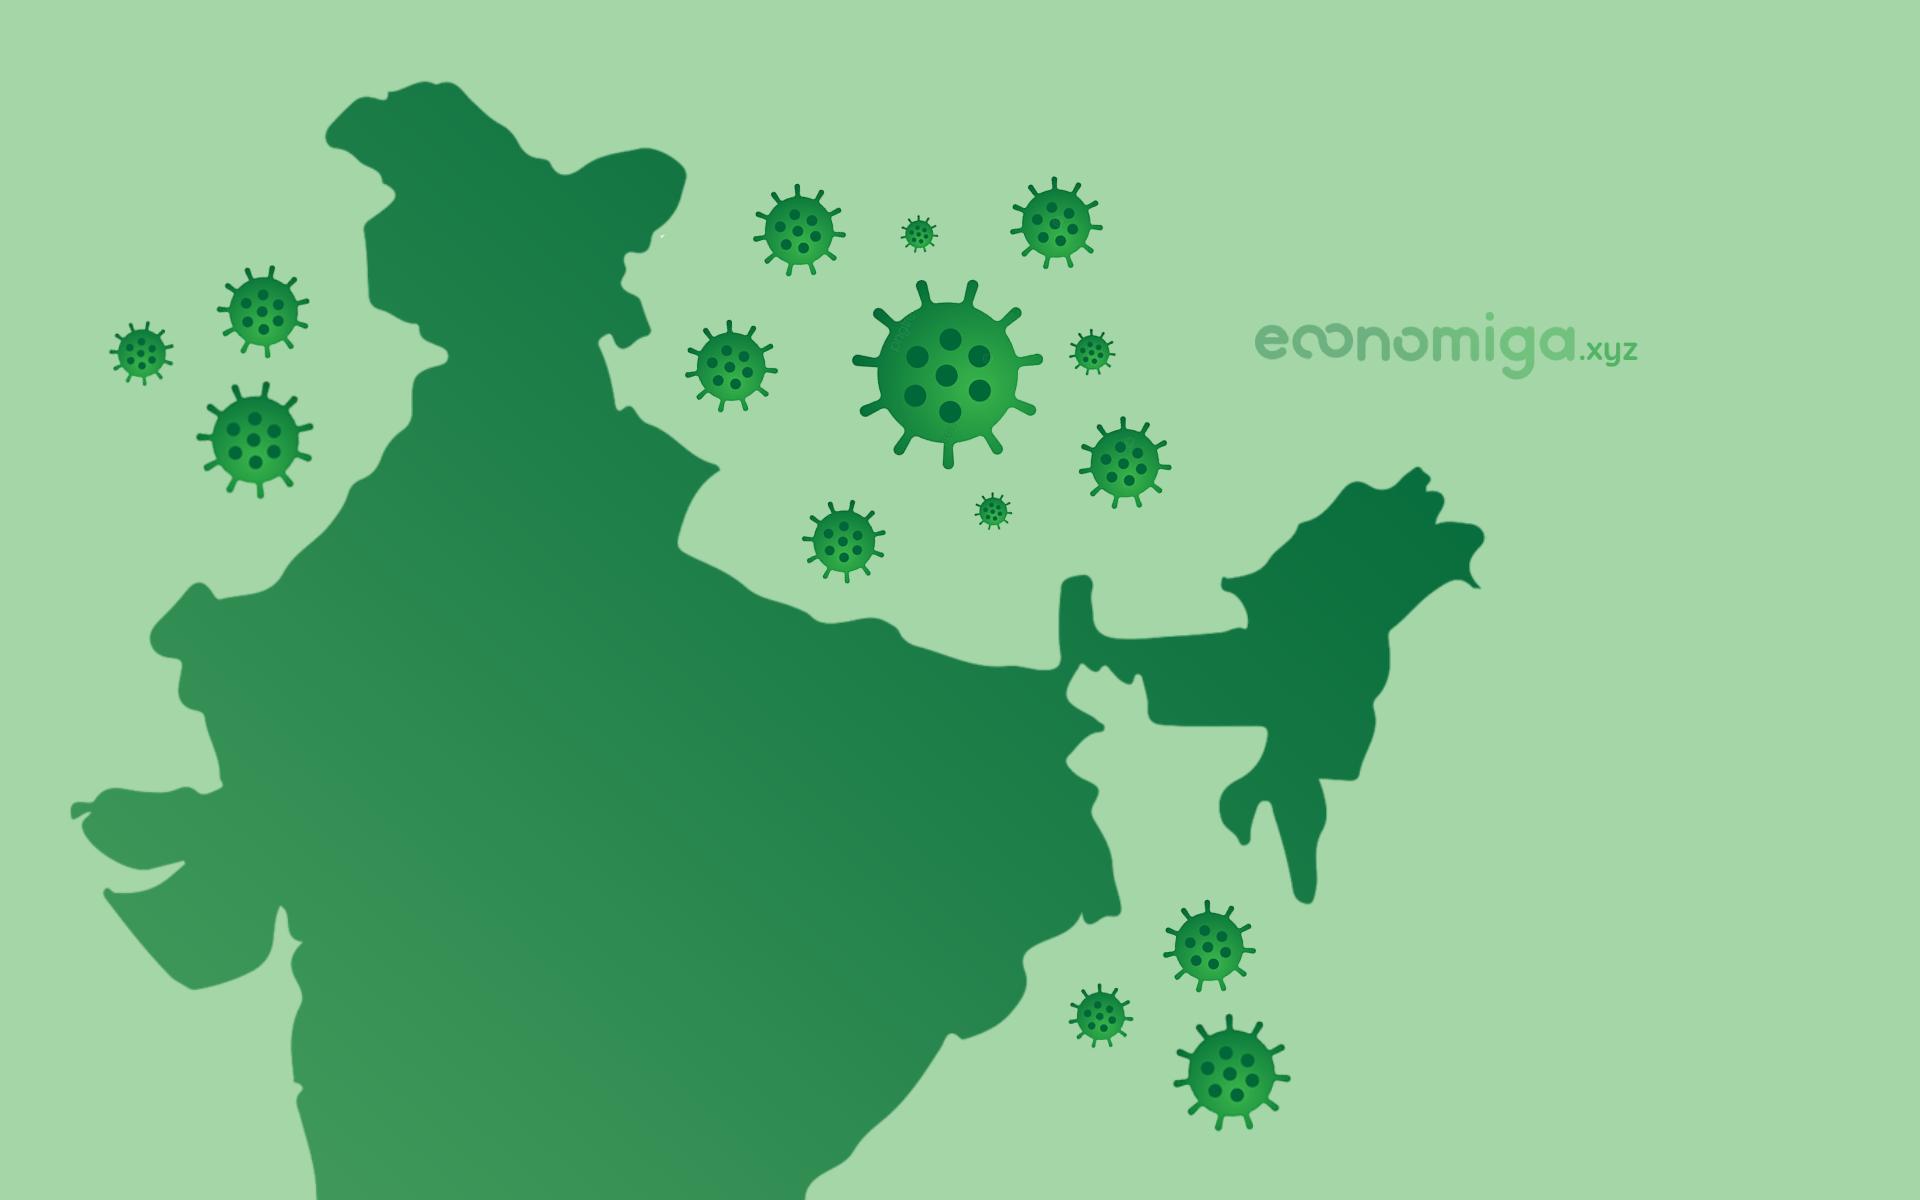 Covidonomics: Impact of Covid-19 on Indian Economy